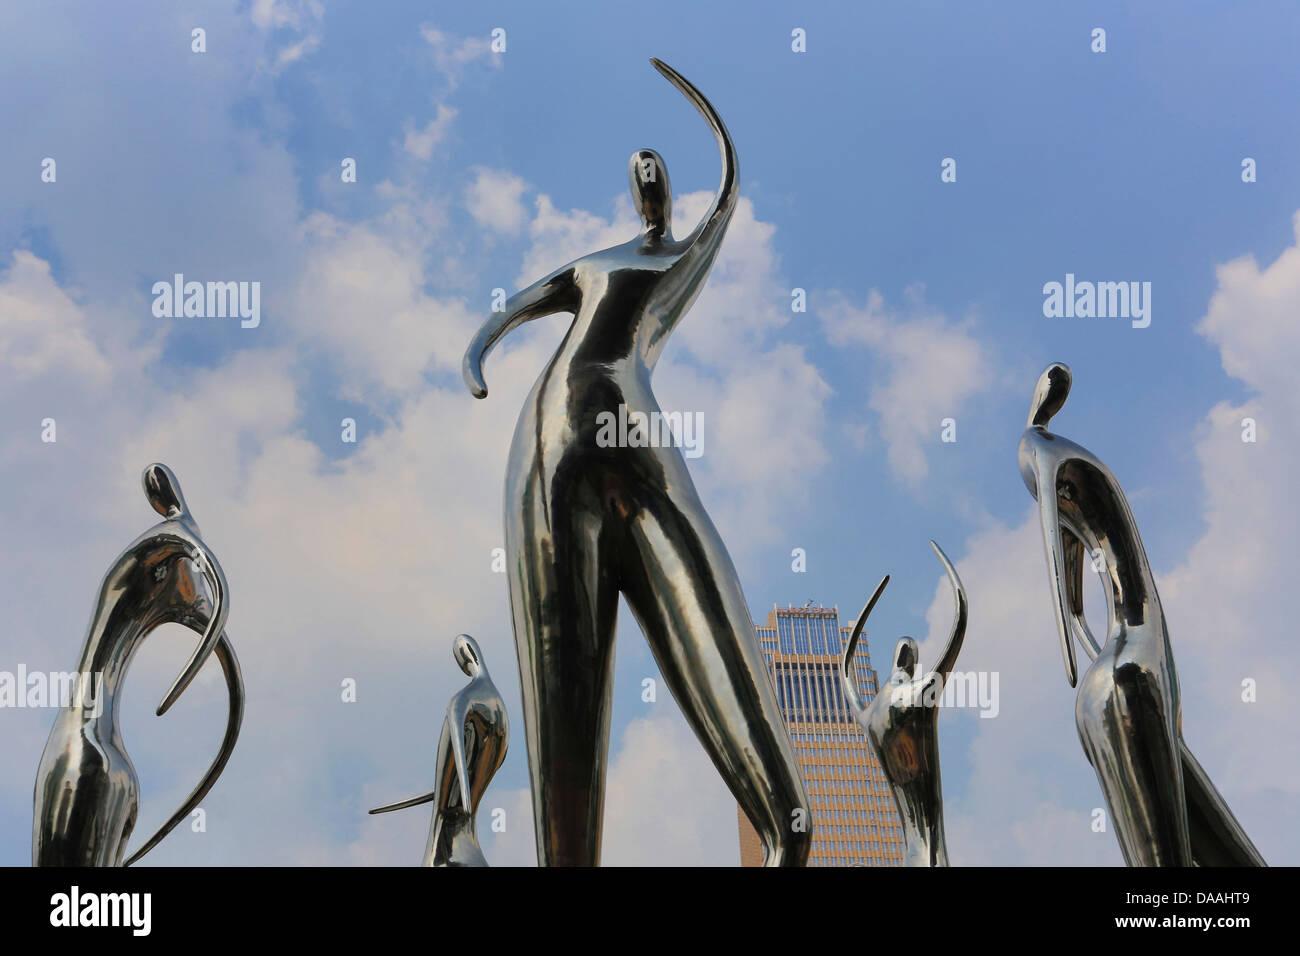 China, Shenzhen, City, Asia, Futian Ward, street sculpture, dancing, decoration, China, Asia, China modern, new, - Stock Image